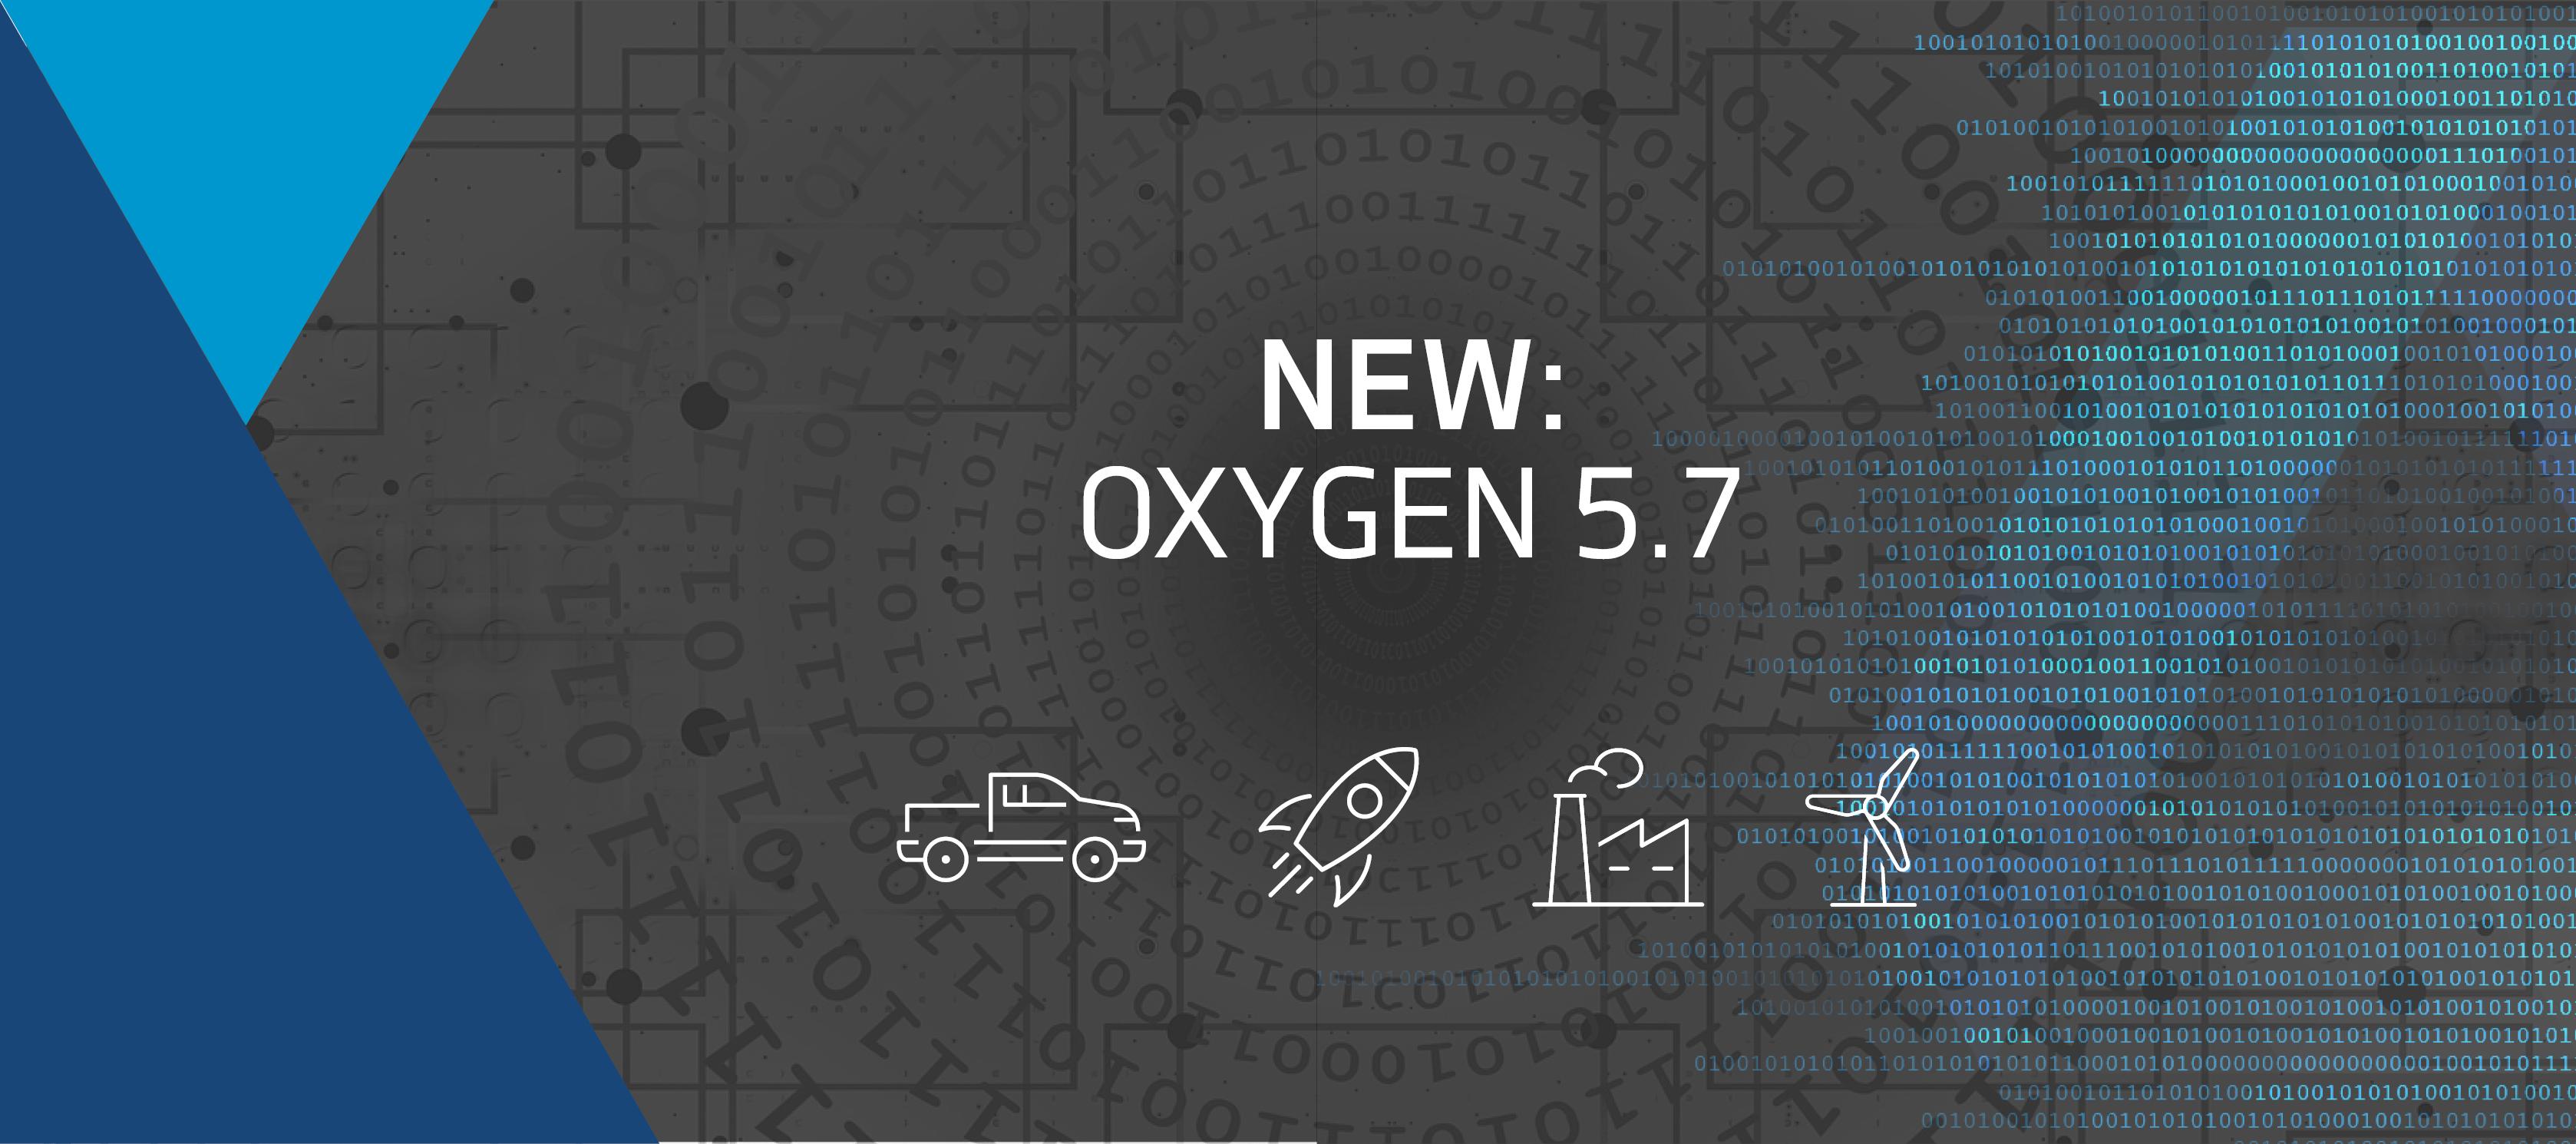 header-oxygen-release-5.7